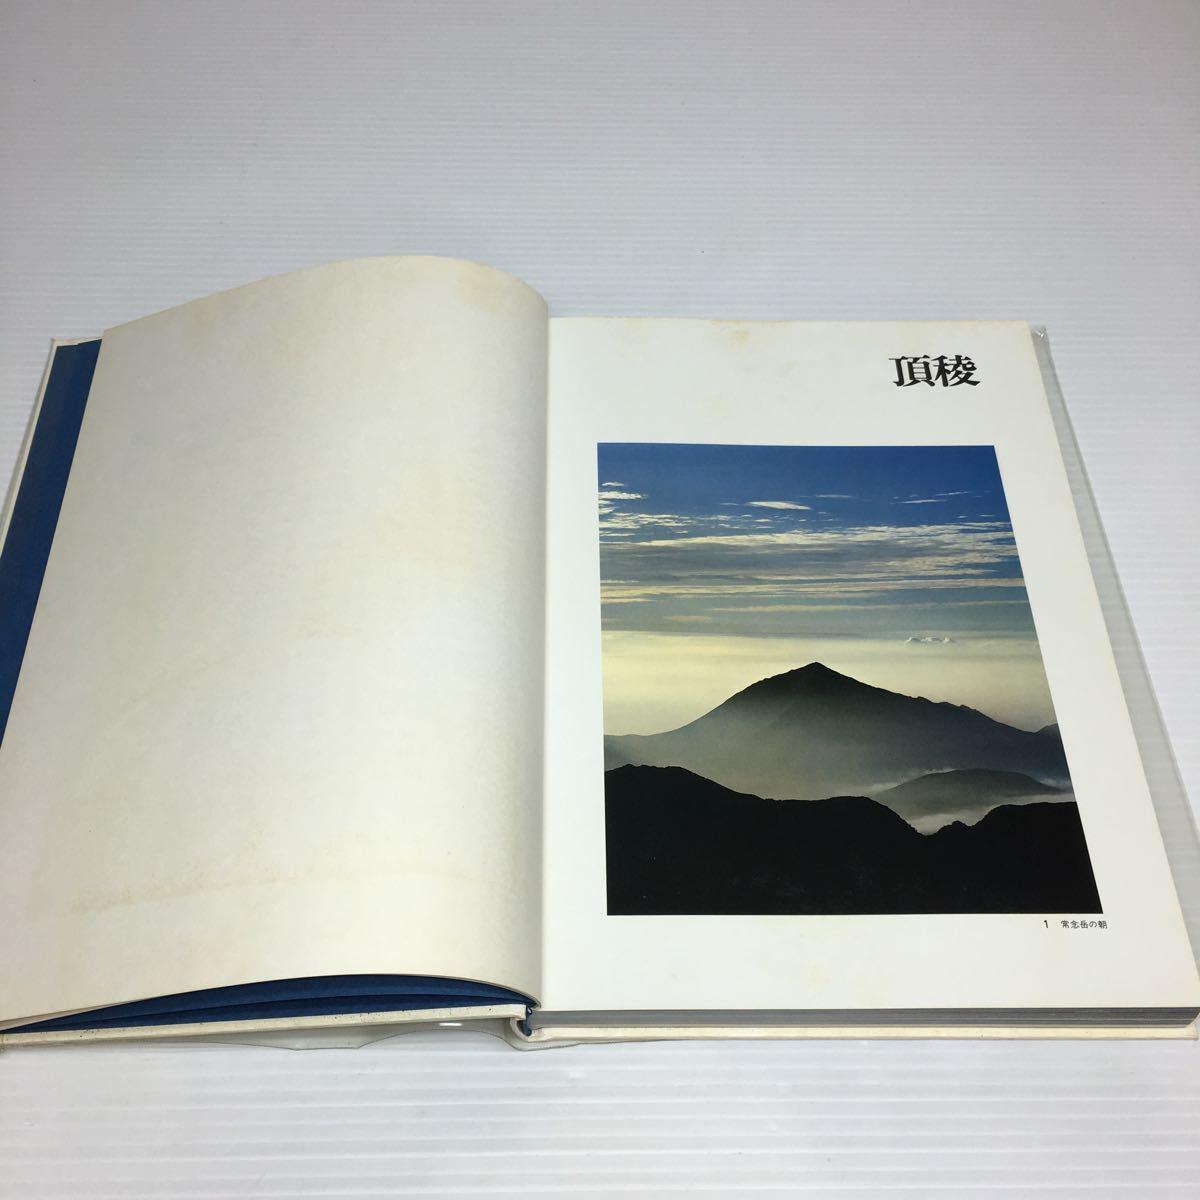 x2/北アルプス 日本山岳写真集団 昭和54年初版 定価8000円_画像6